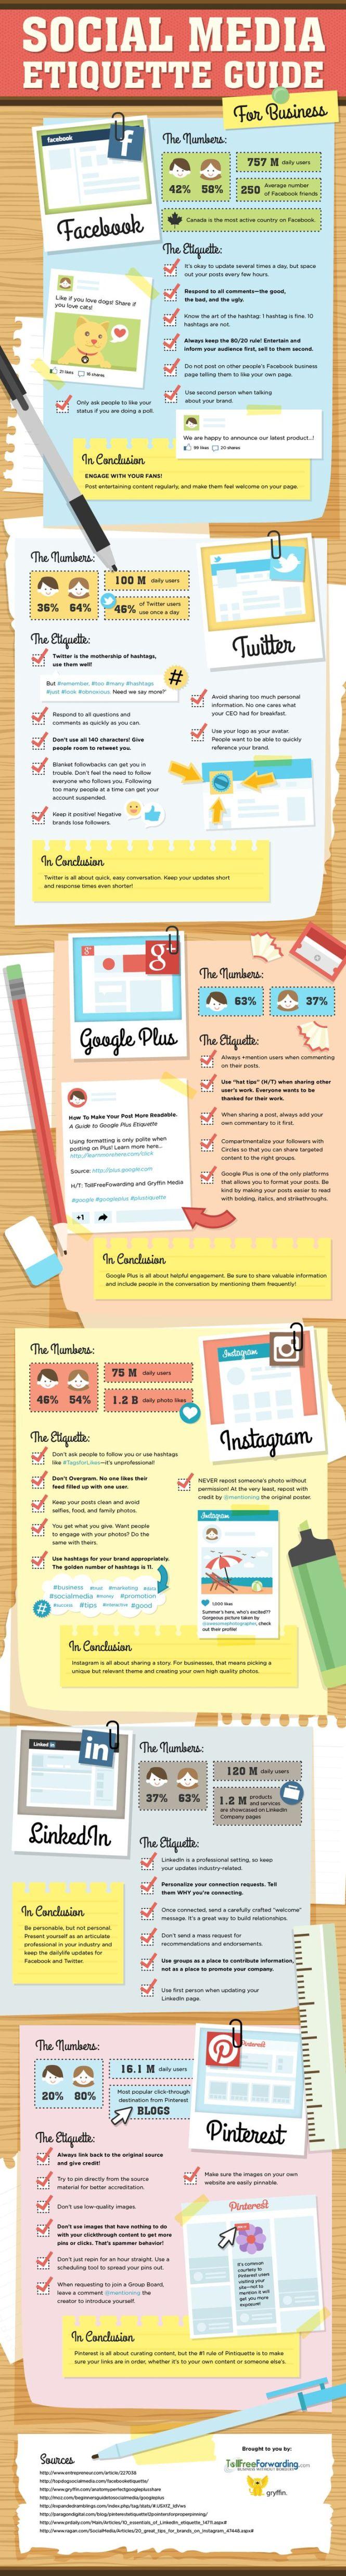 regole social media